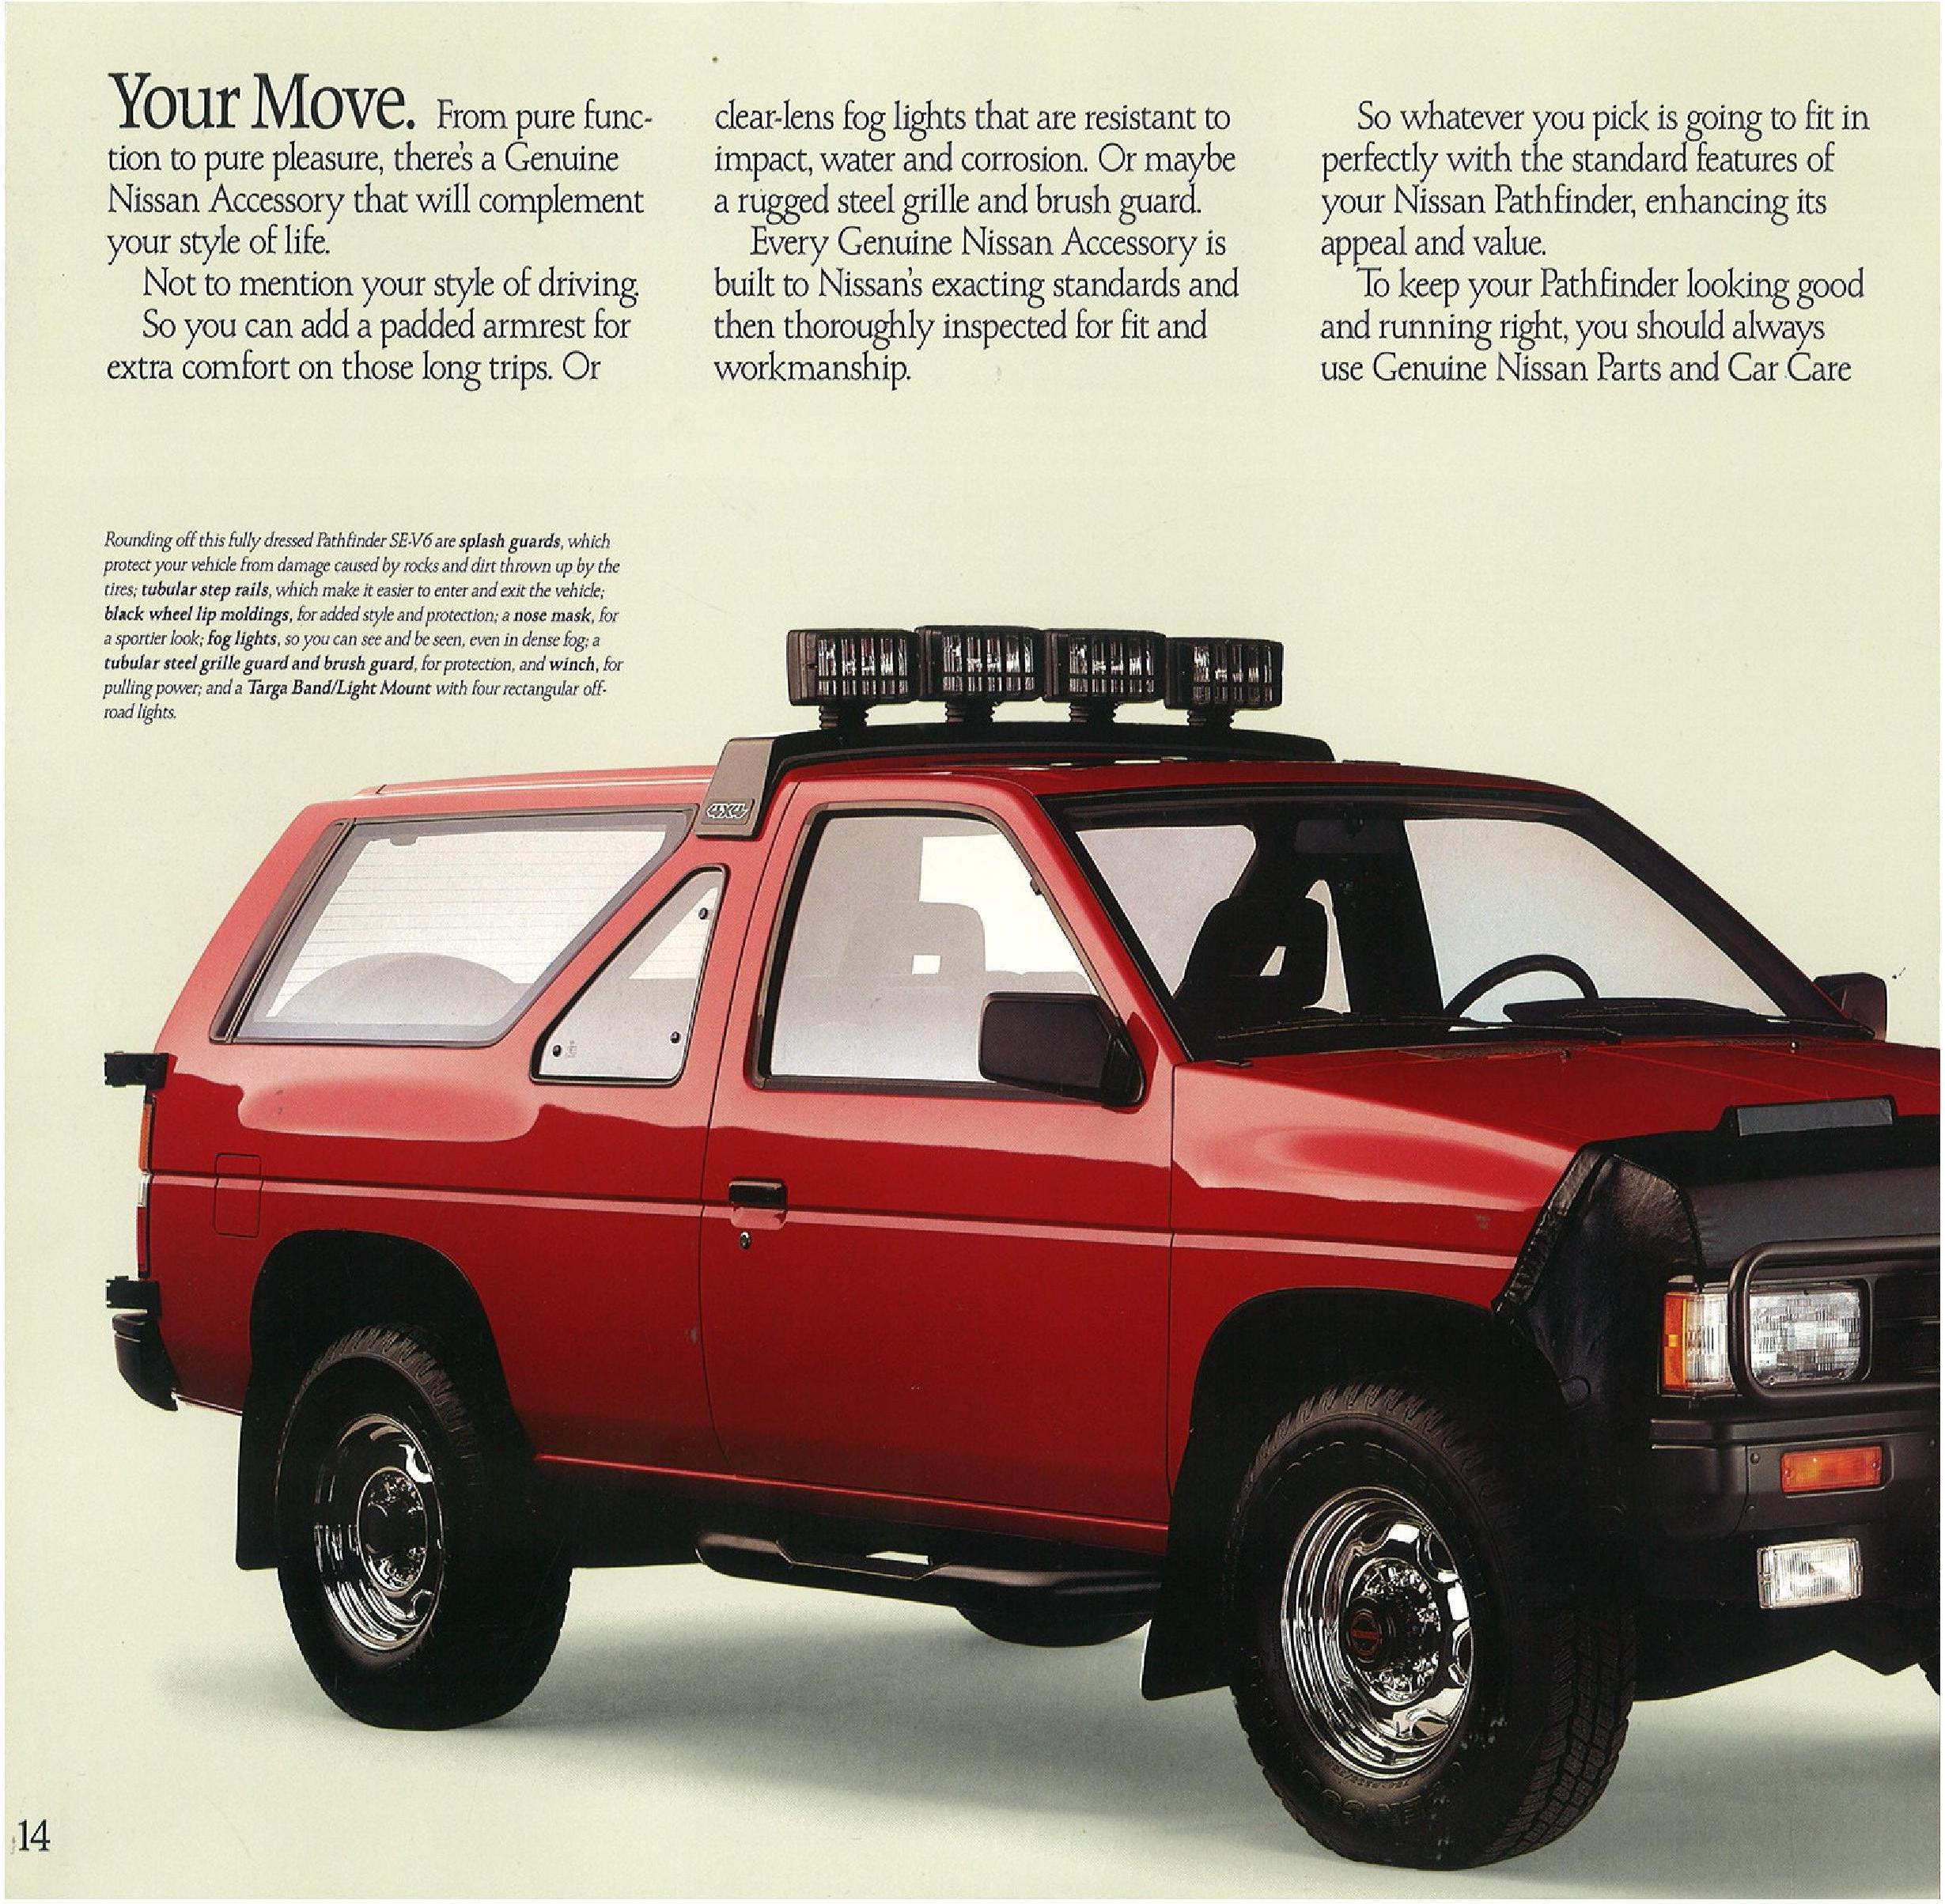 Nissan Extended Warranty >> 1989 Nissan Pathfinder Dealer Brochure - NICOclub